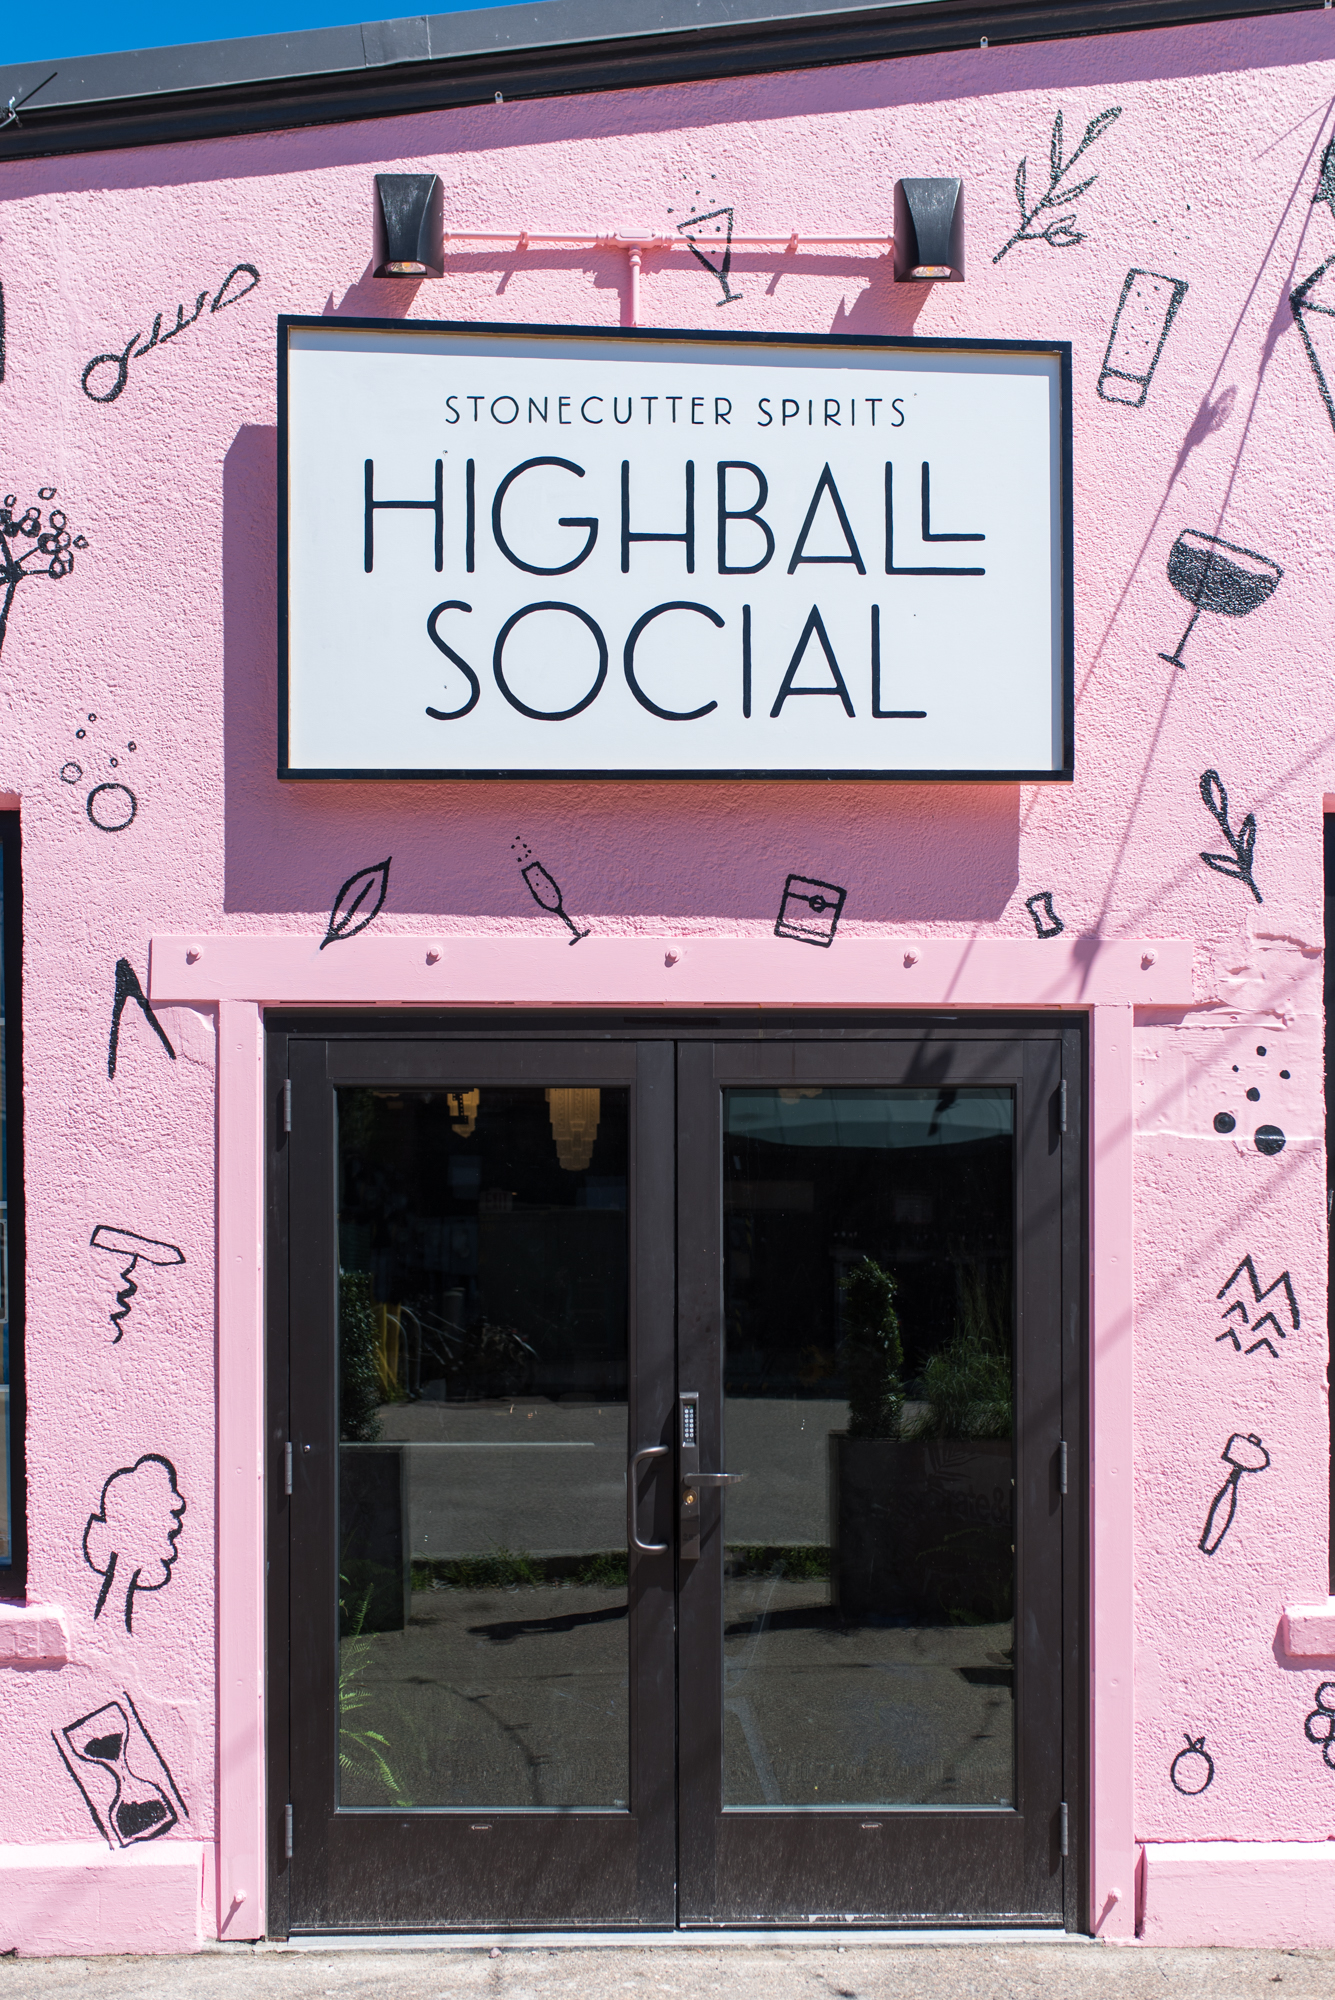 Highball-Social-Stonecutter-Spirits-_DSC4293-Edit©Elisabeth-Waller.jpg